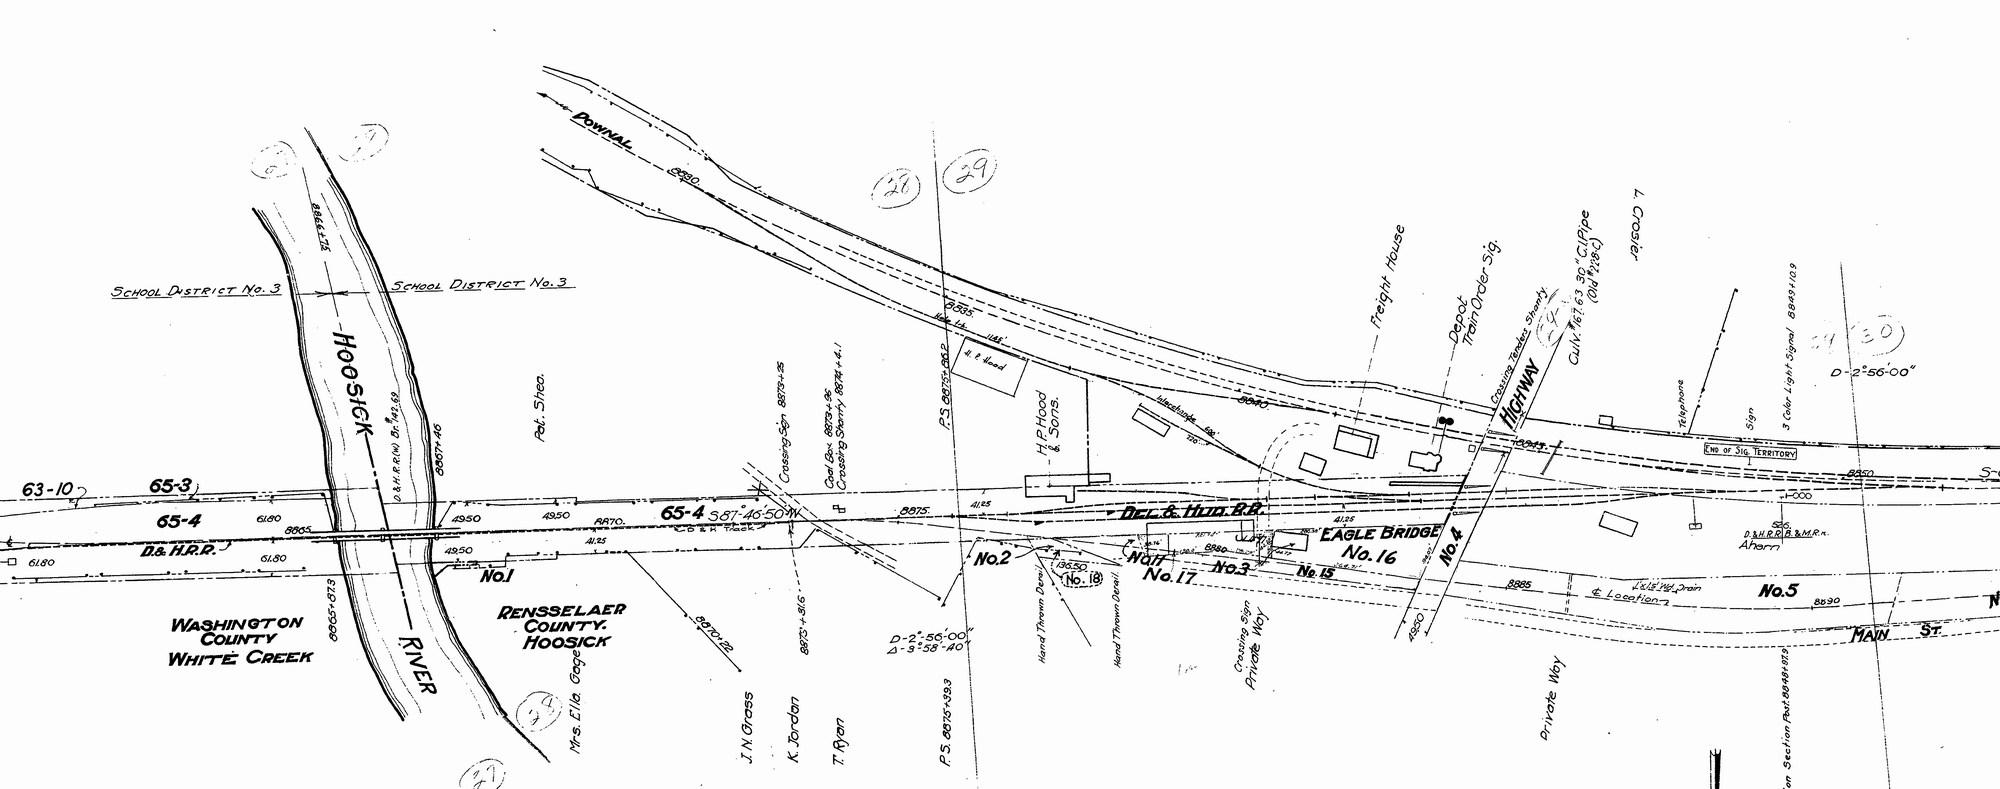 Boston Amp Maine Railroad N Plan Sample